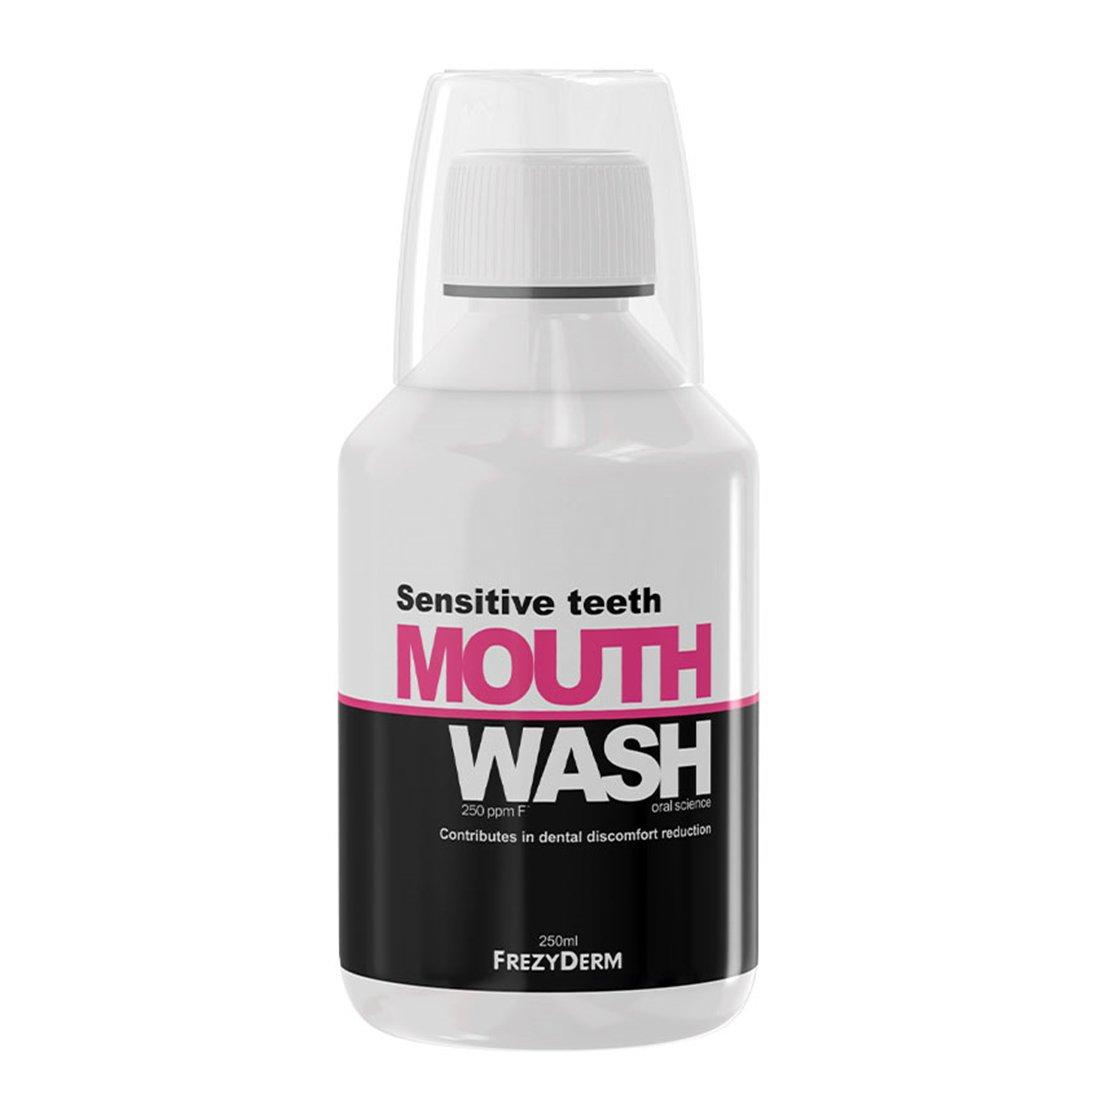 Frezyderm Sensitive Teeth Mouthwash Φθοριούχο Στοματικό Διάλυμα για την Καθημερινή Φροντίδα των Ευαίσθητων Δοντιών 250ml